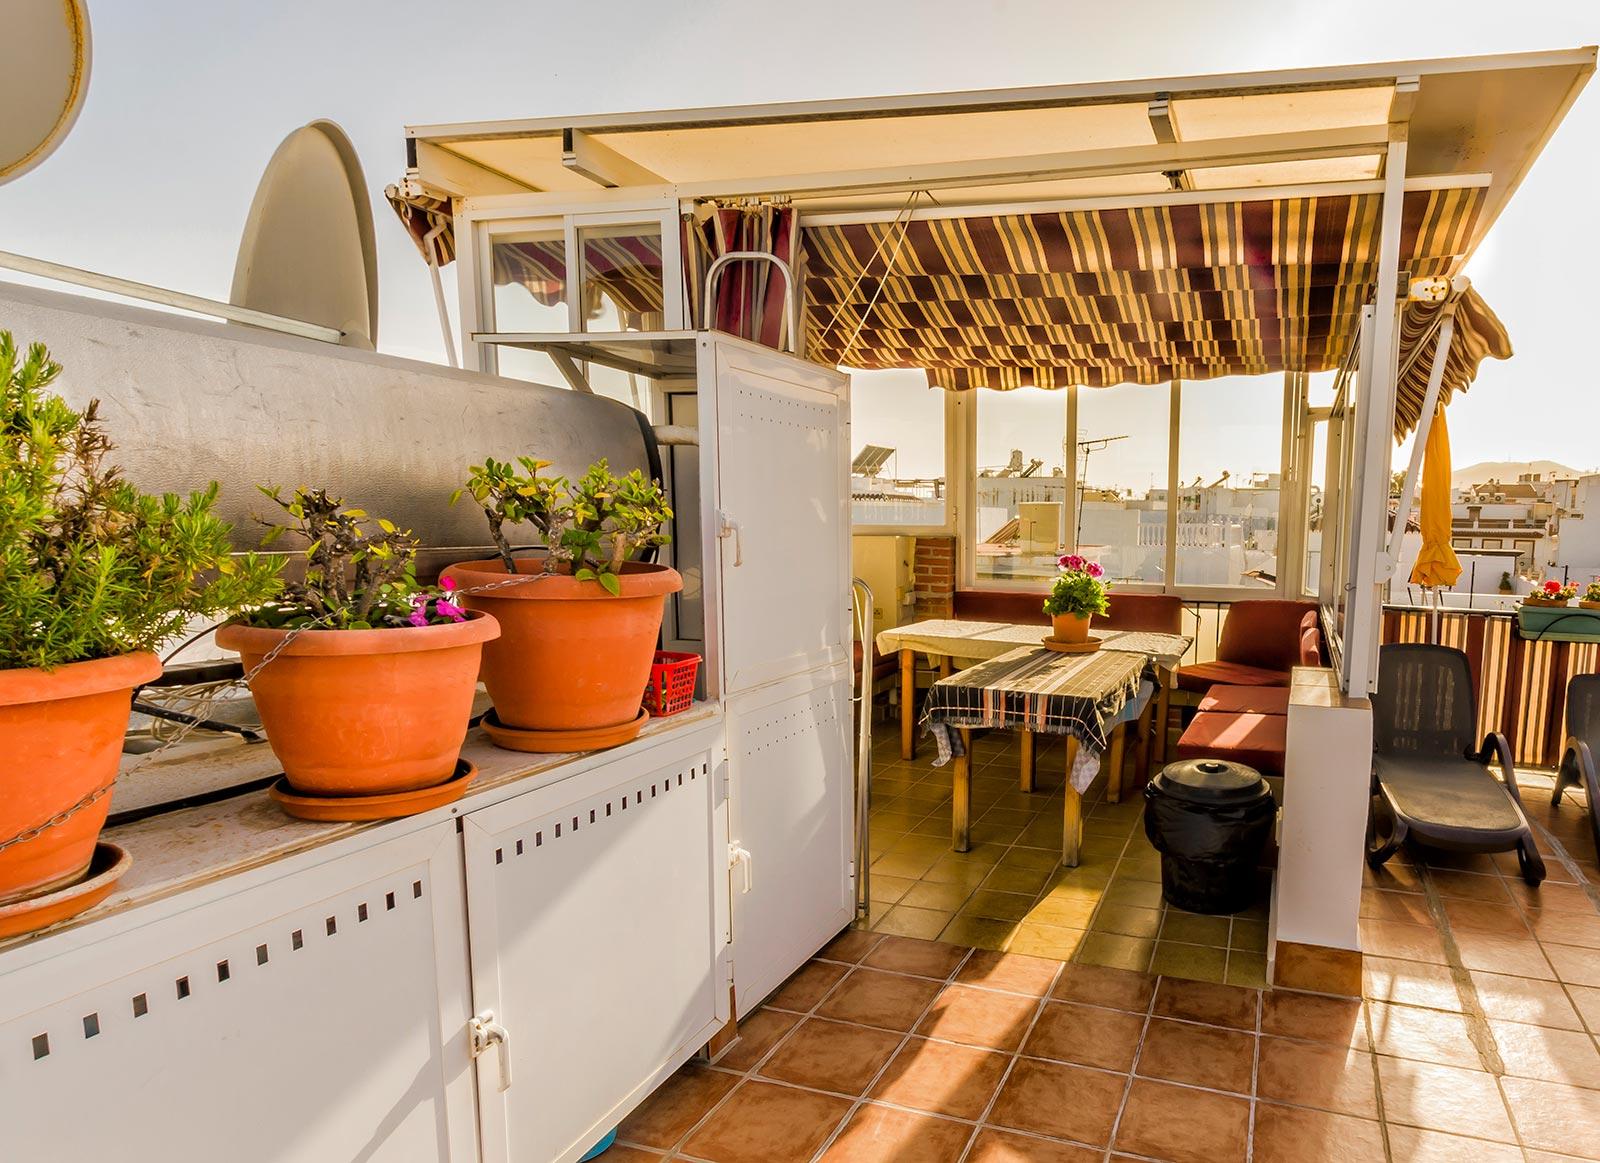 Casa-charlotte terracee